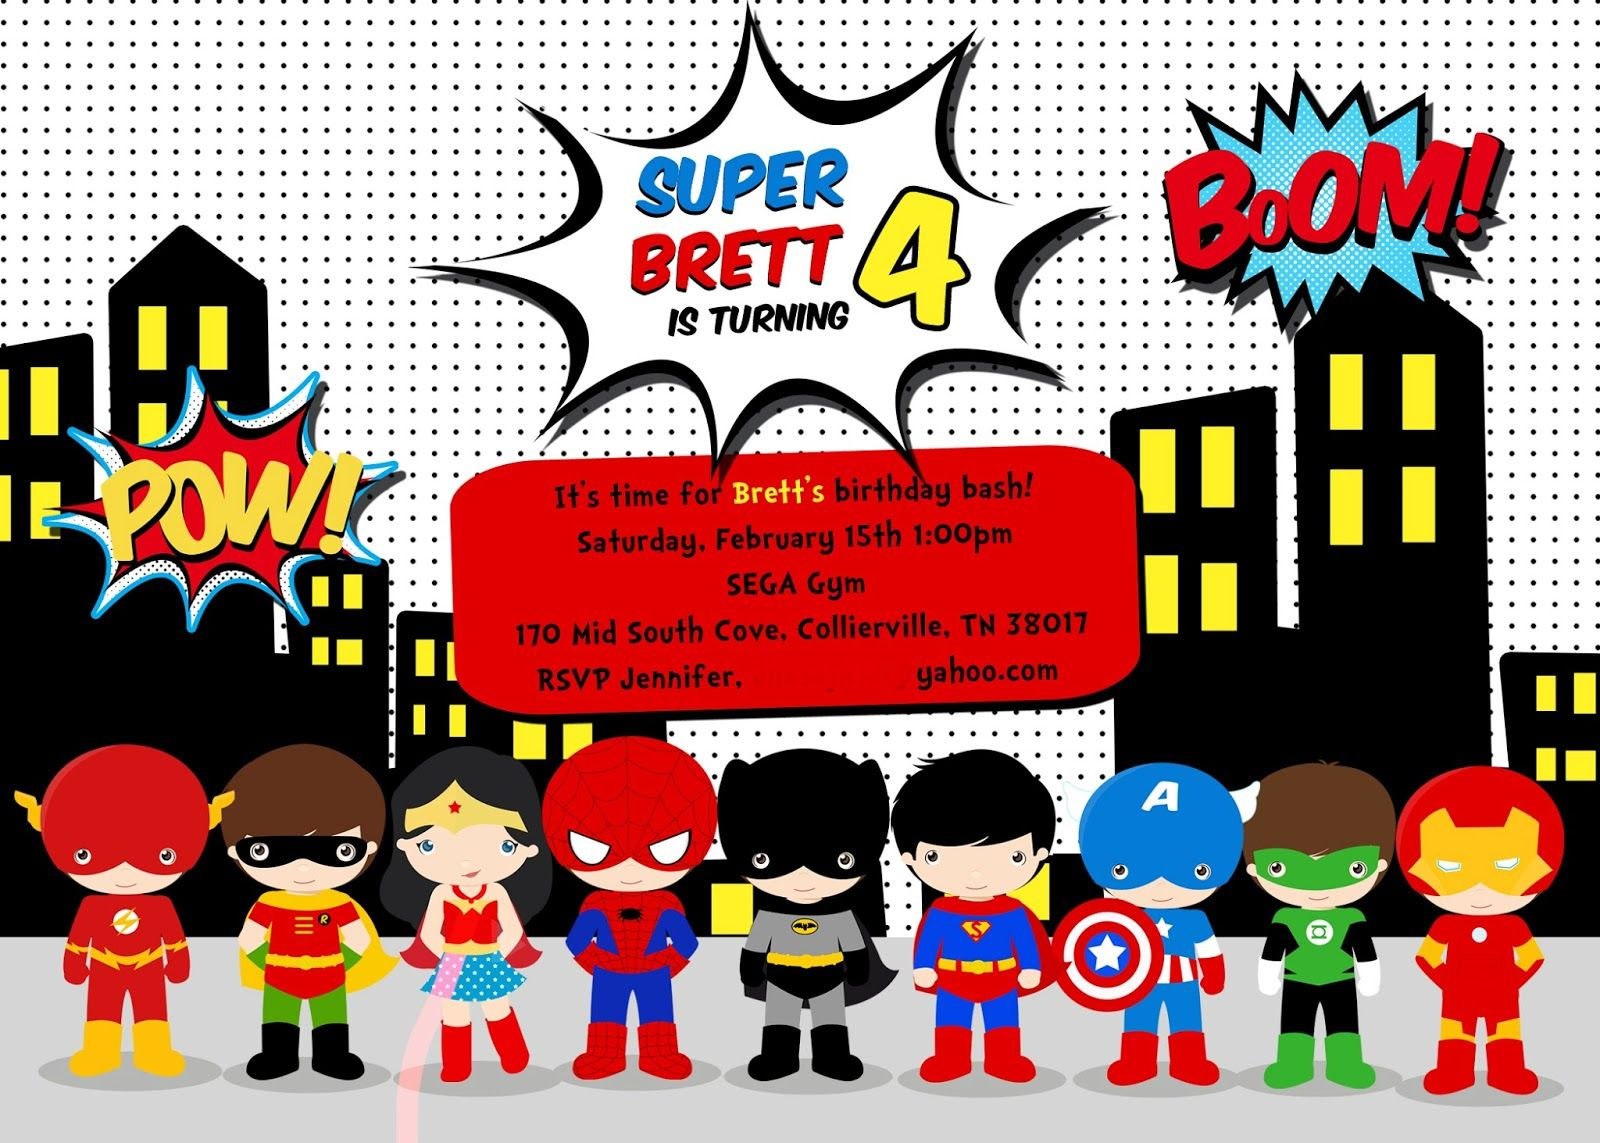 Free Superhero Birthday Invitations Templates – Superhero Birthday Invitations Free Printable